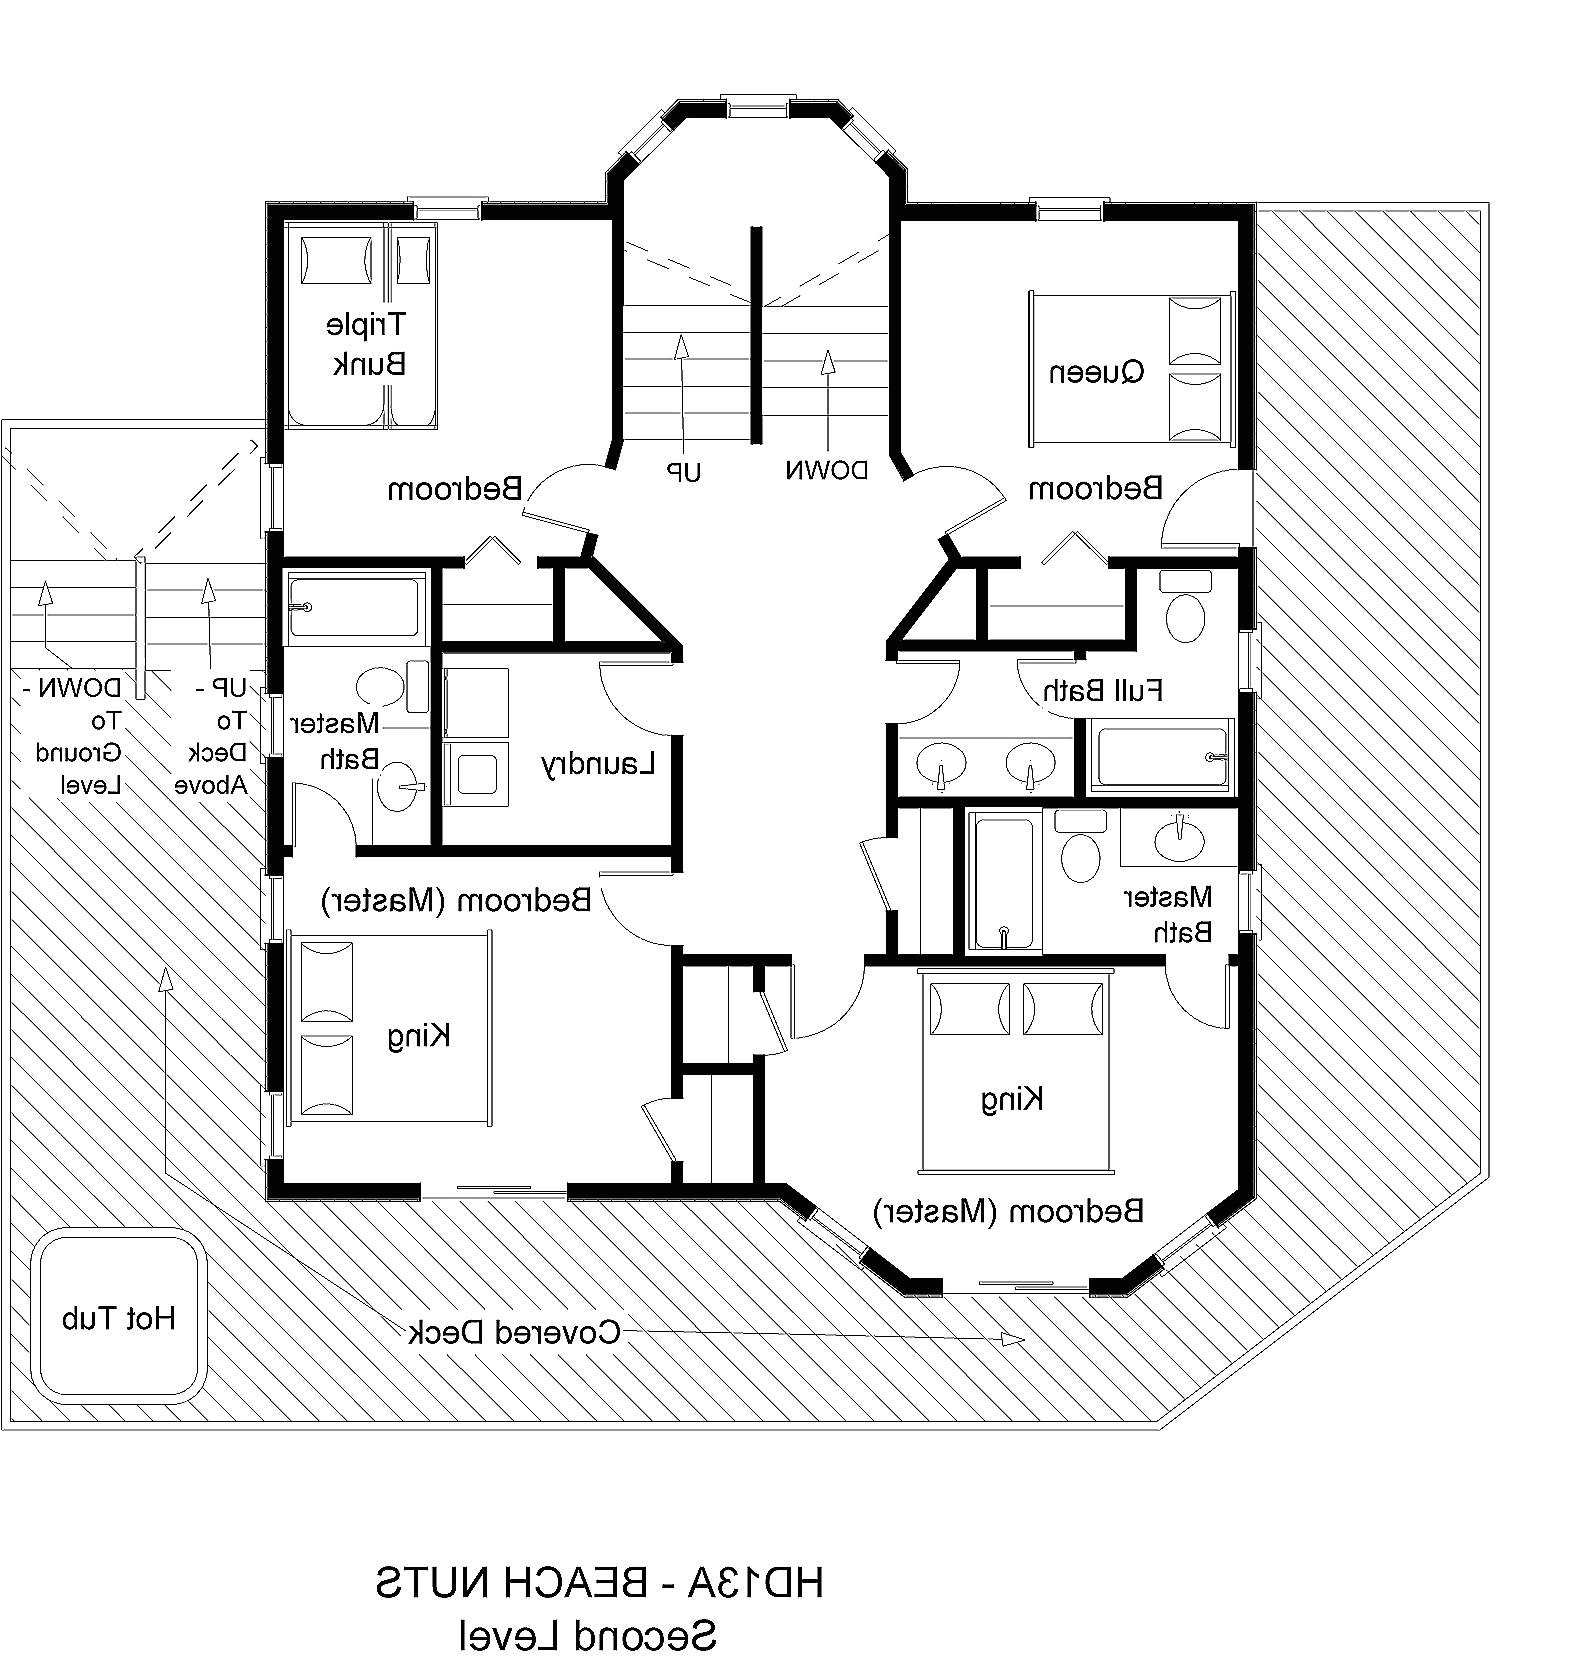 modular home floor plans missouri beautiful log cabin home floor plans luxury log cabin floor plans awesome log